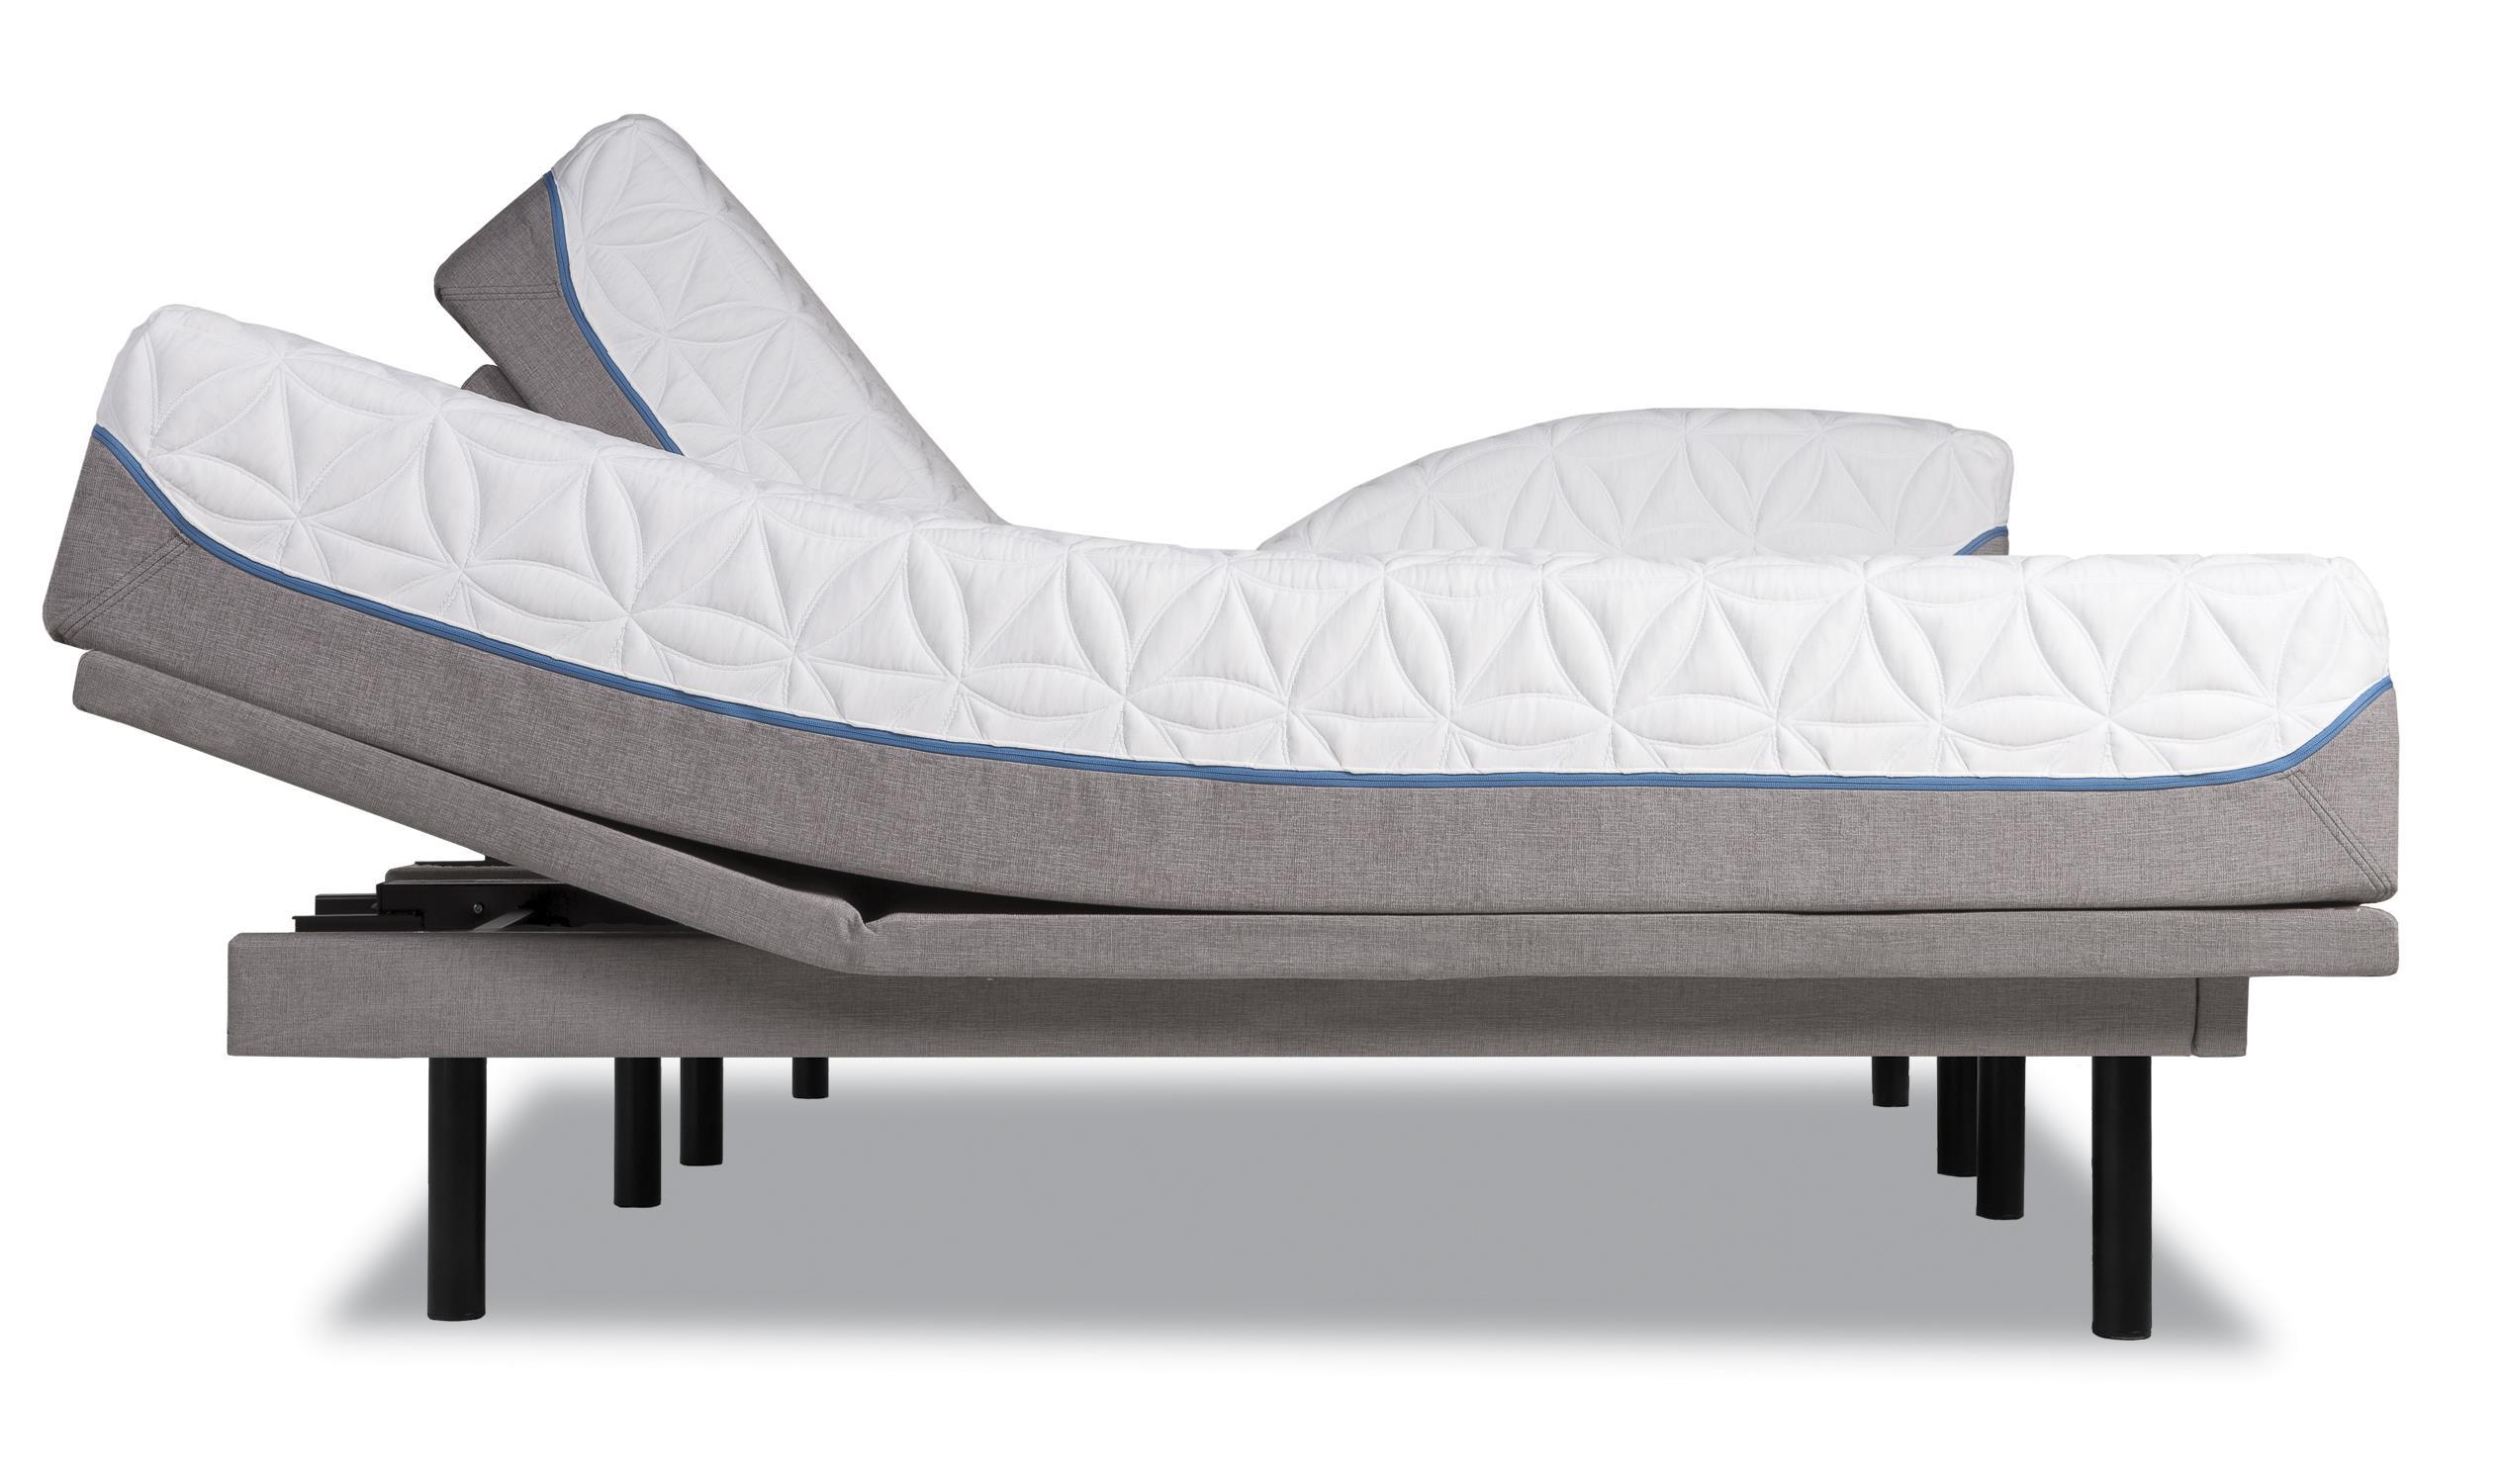 Tempur-Pedic® TEMPUR-Cloud Elite Cal King Extra-Soft Mattress Set - Item Number: 10236180+25289290